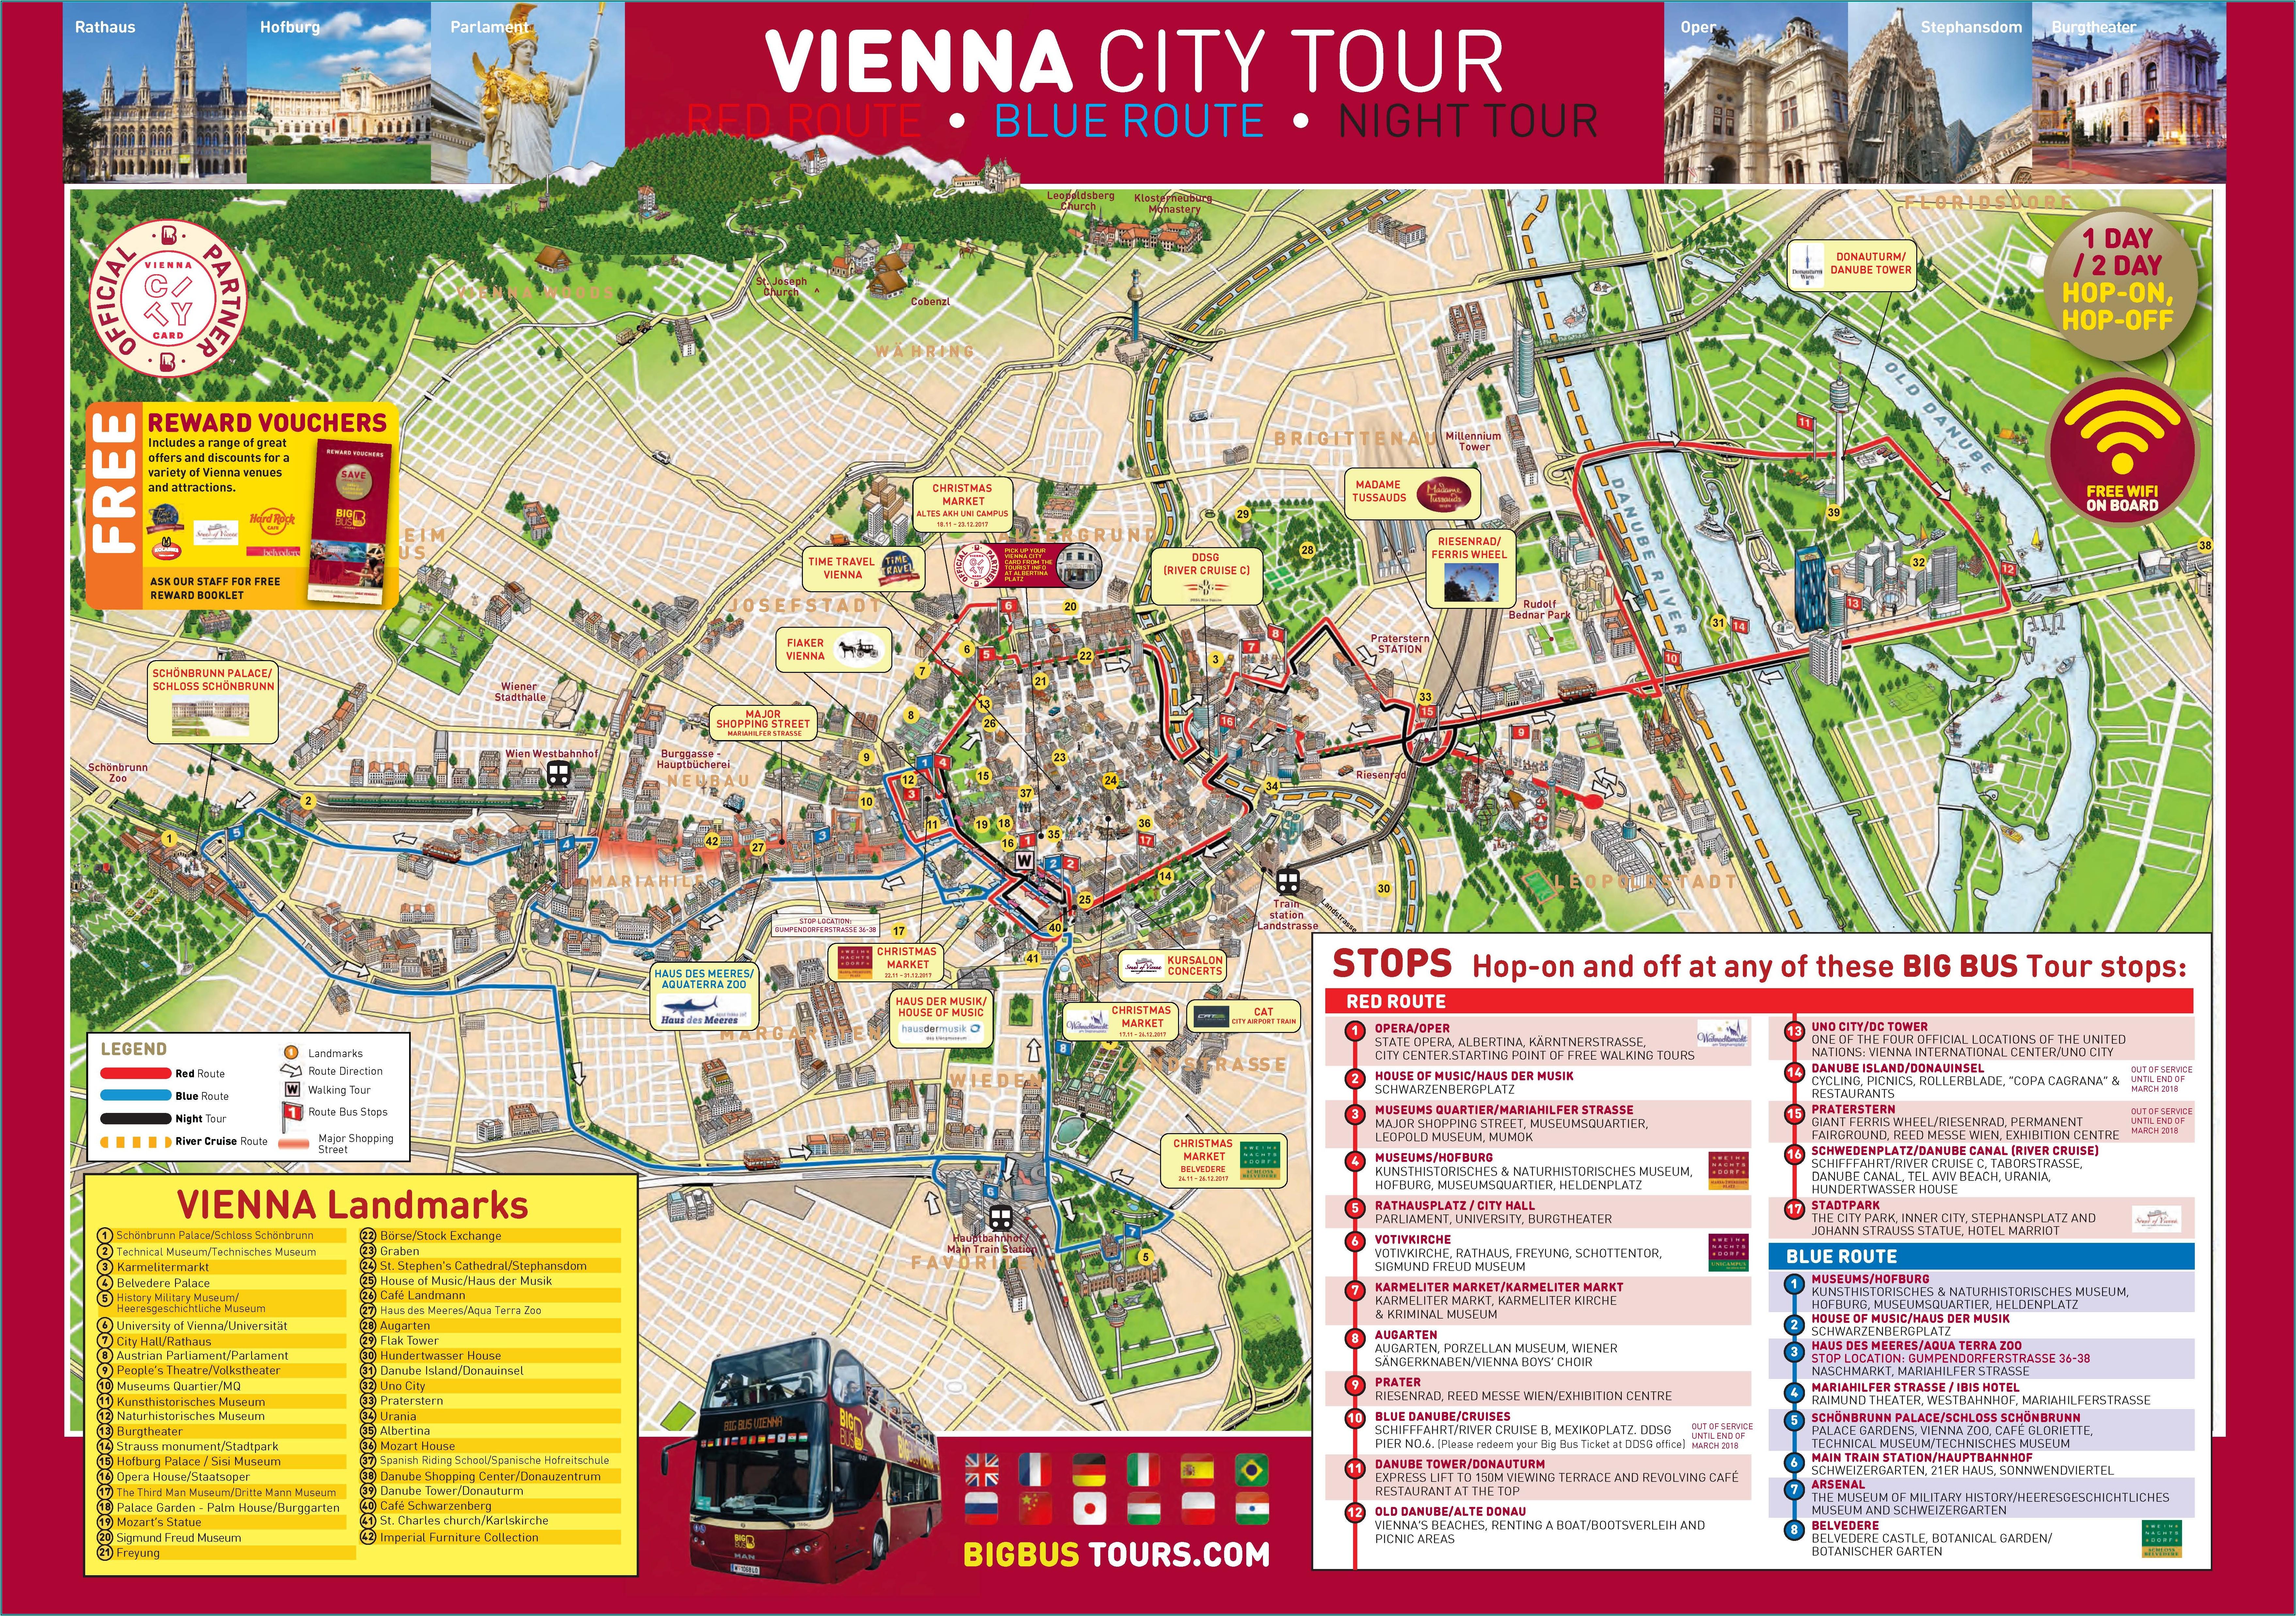 Vienna City Hop On Hop Off Tour Map